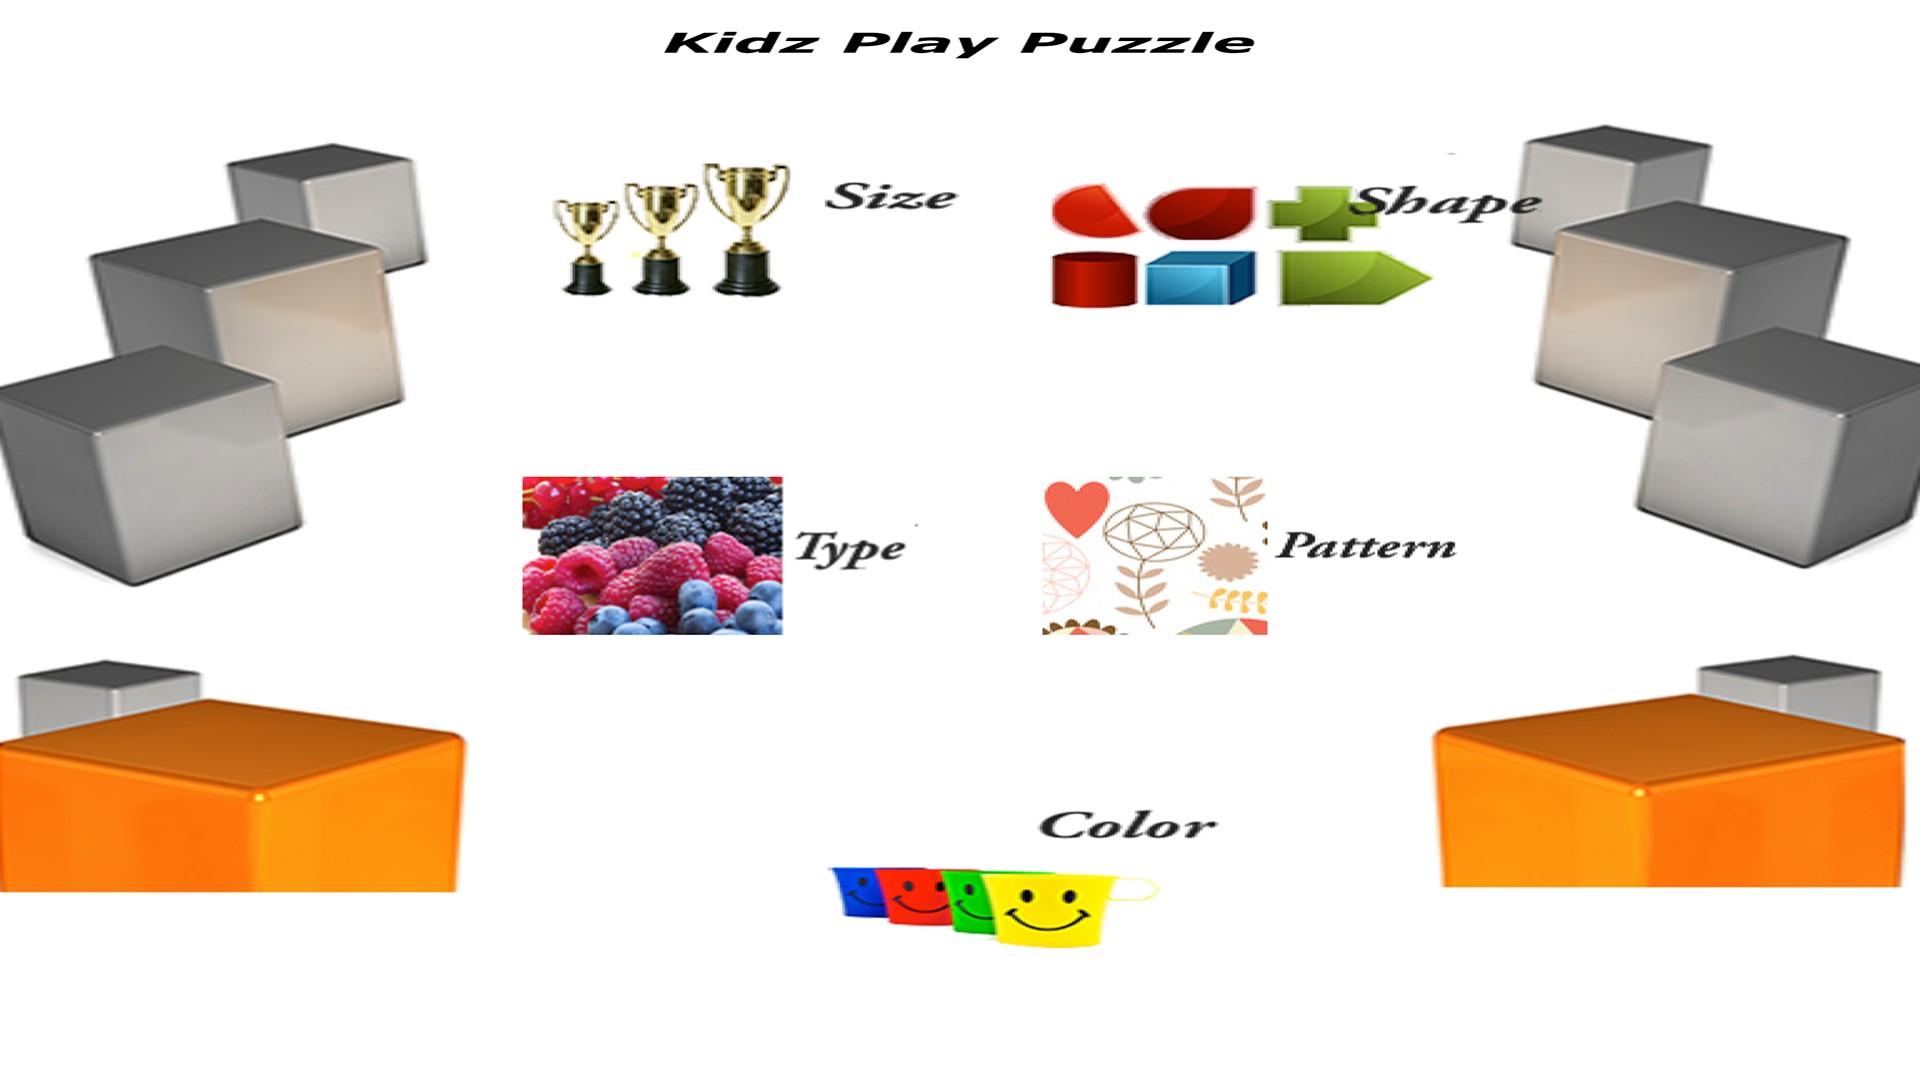 Kidz Play Puzzle